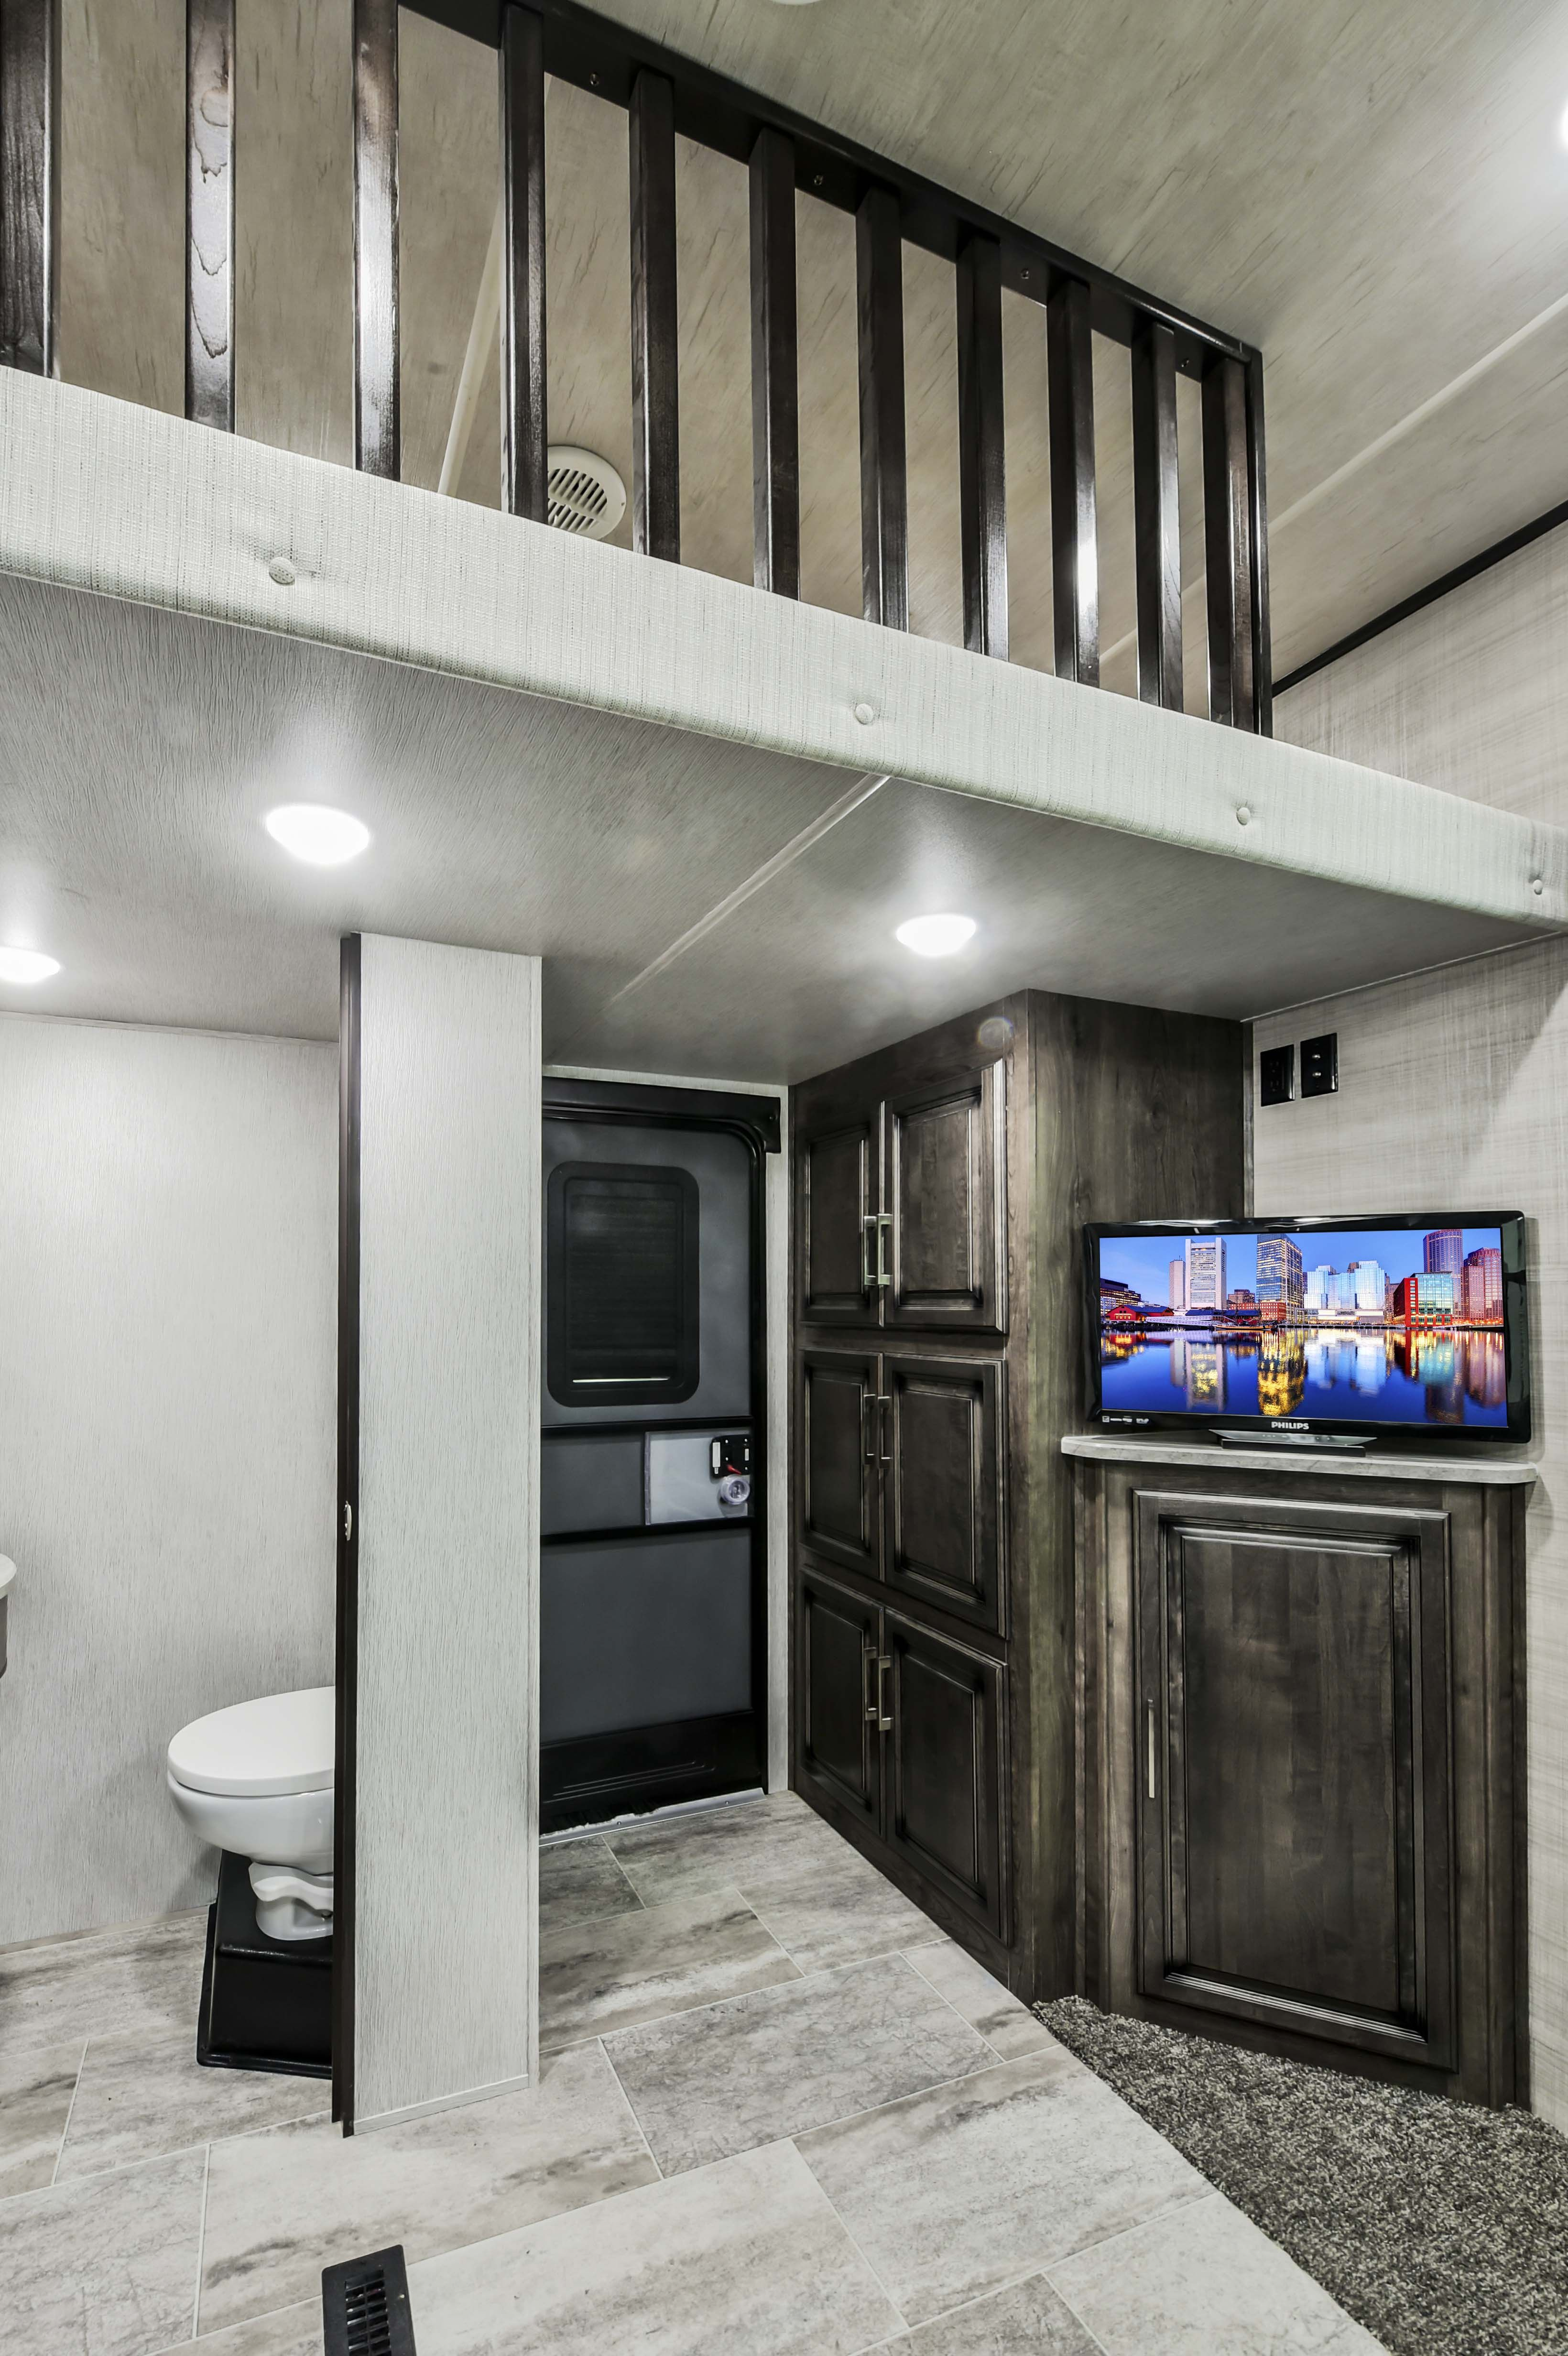 Gw 3810 Rlb Bunk Room Bunk House Rv Living